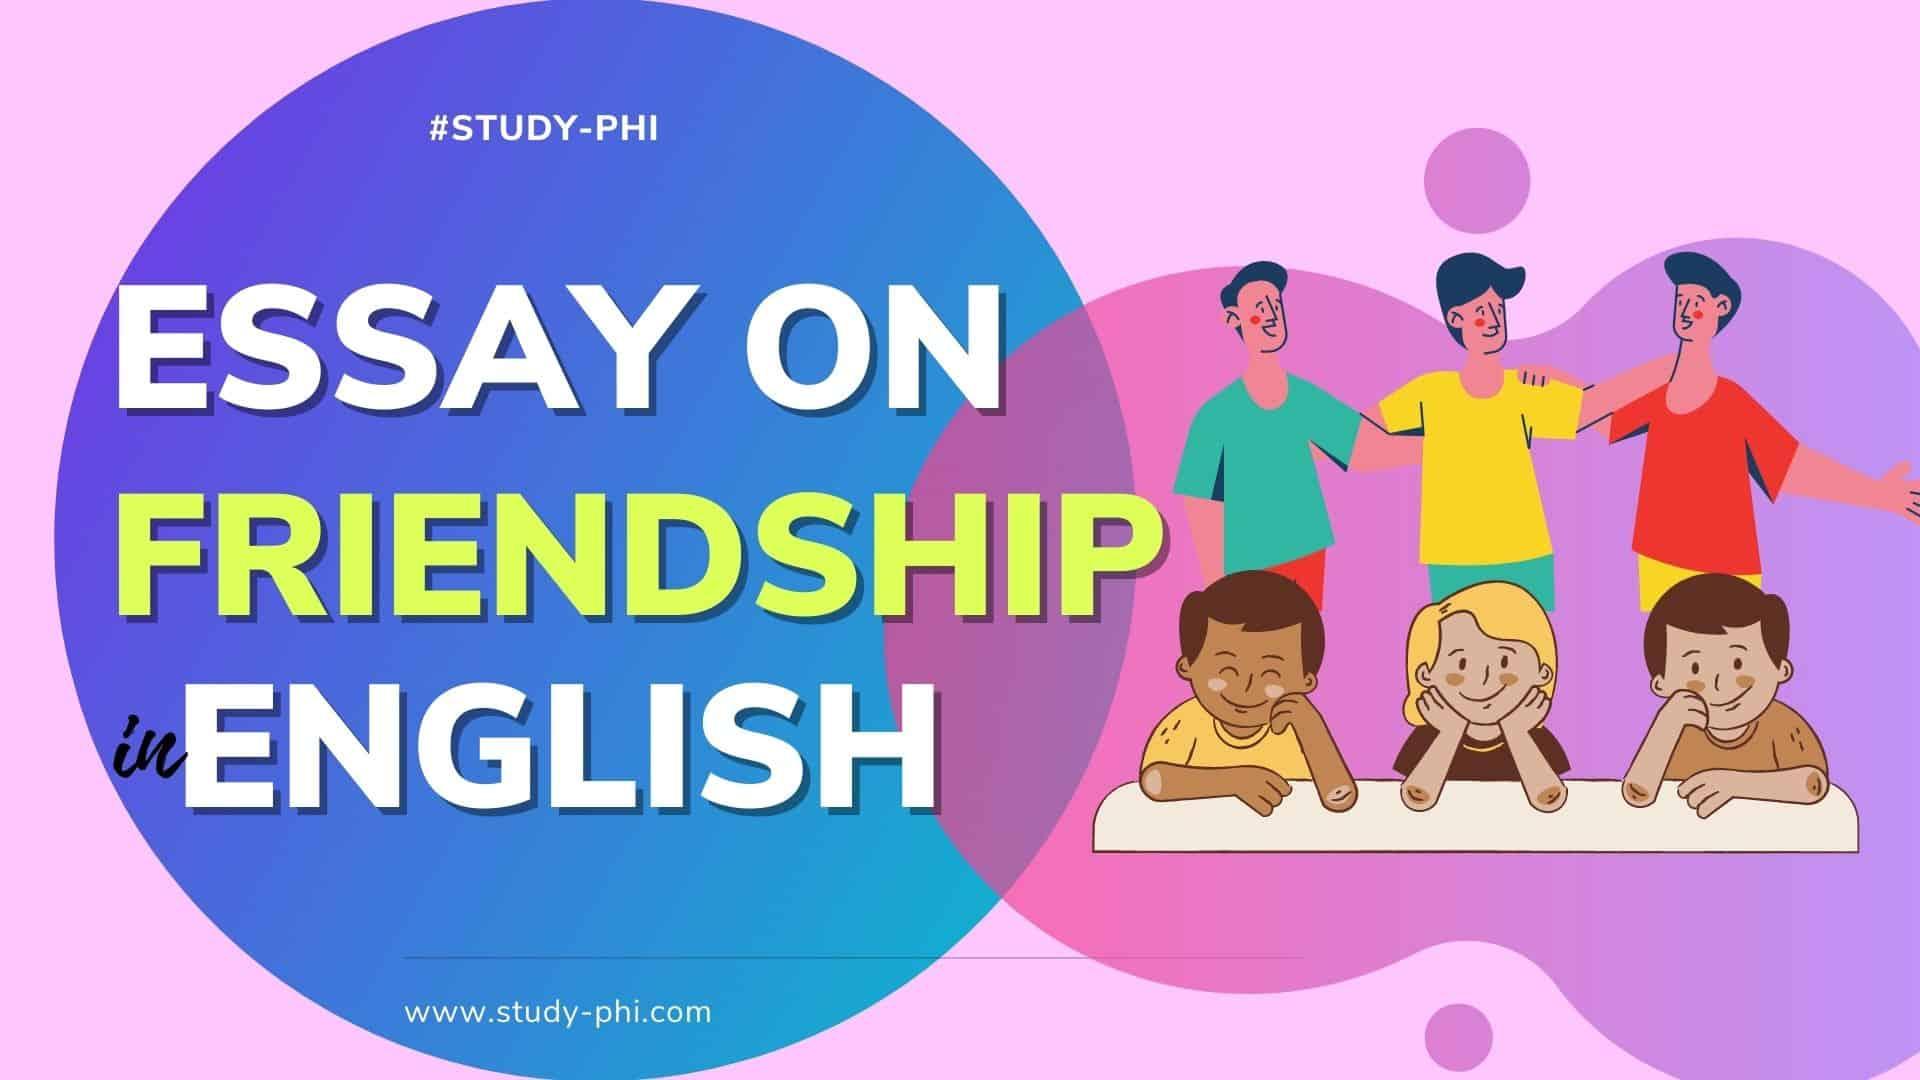 Essay on Friendship in English